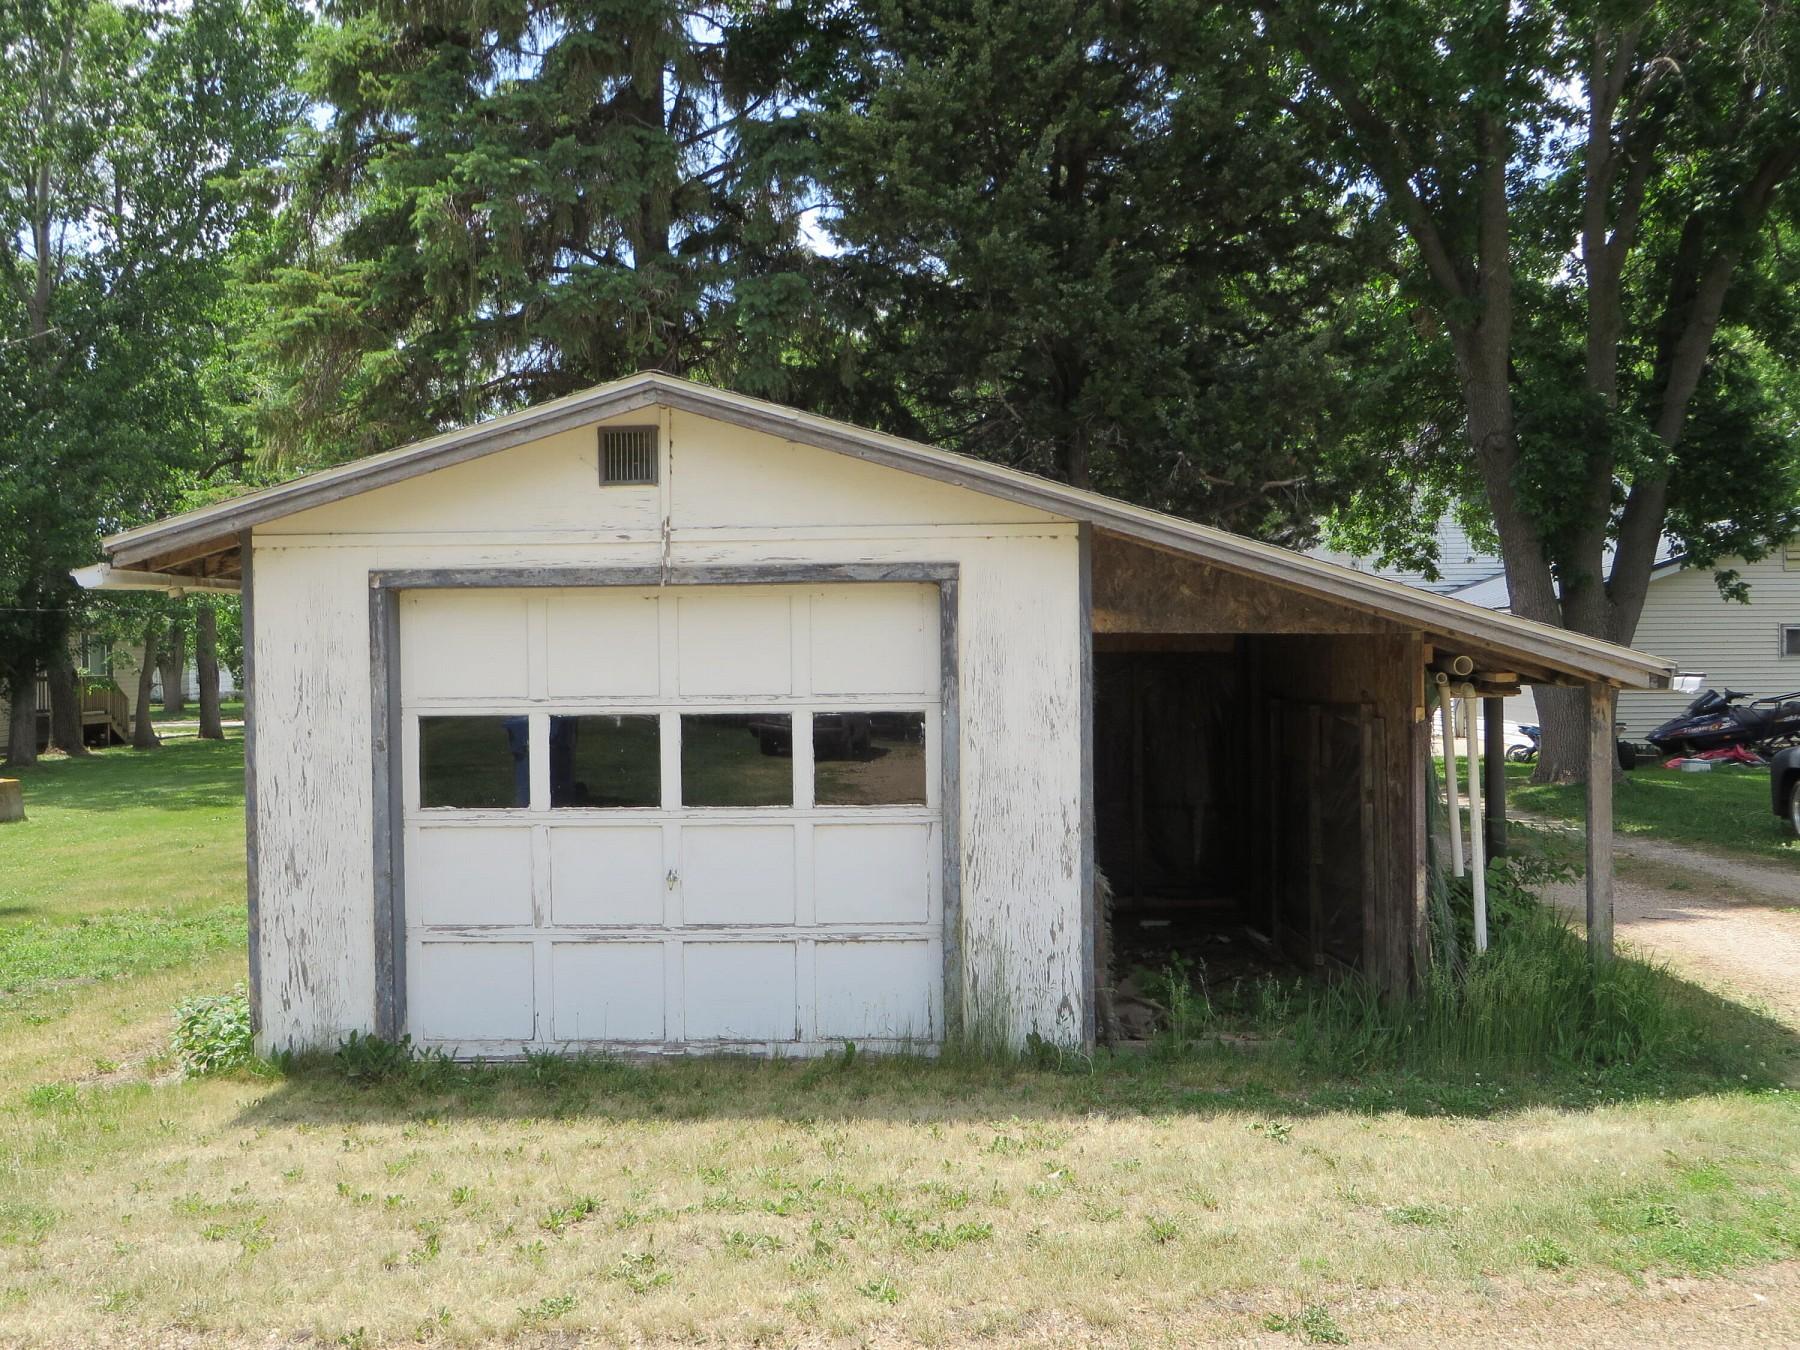 310 FremontAvenueN, Lake Preston, SD 57249